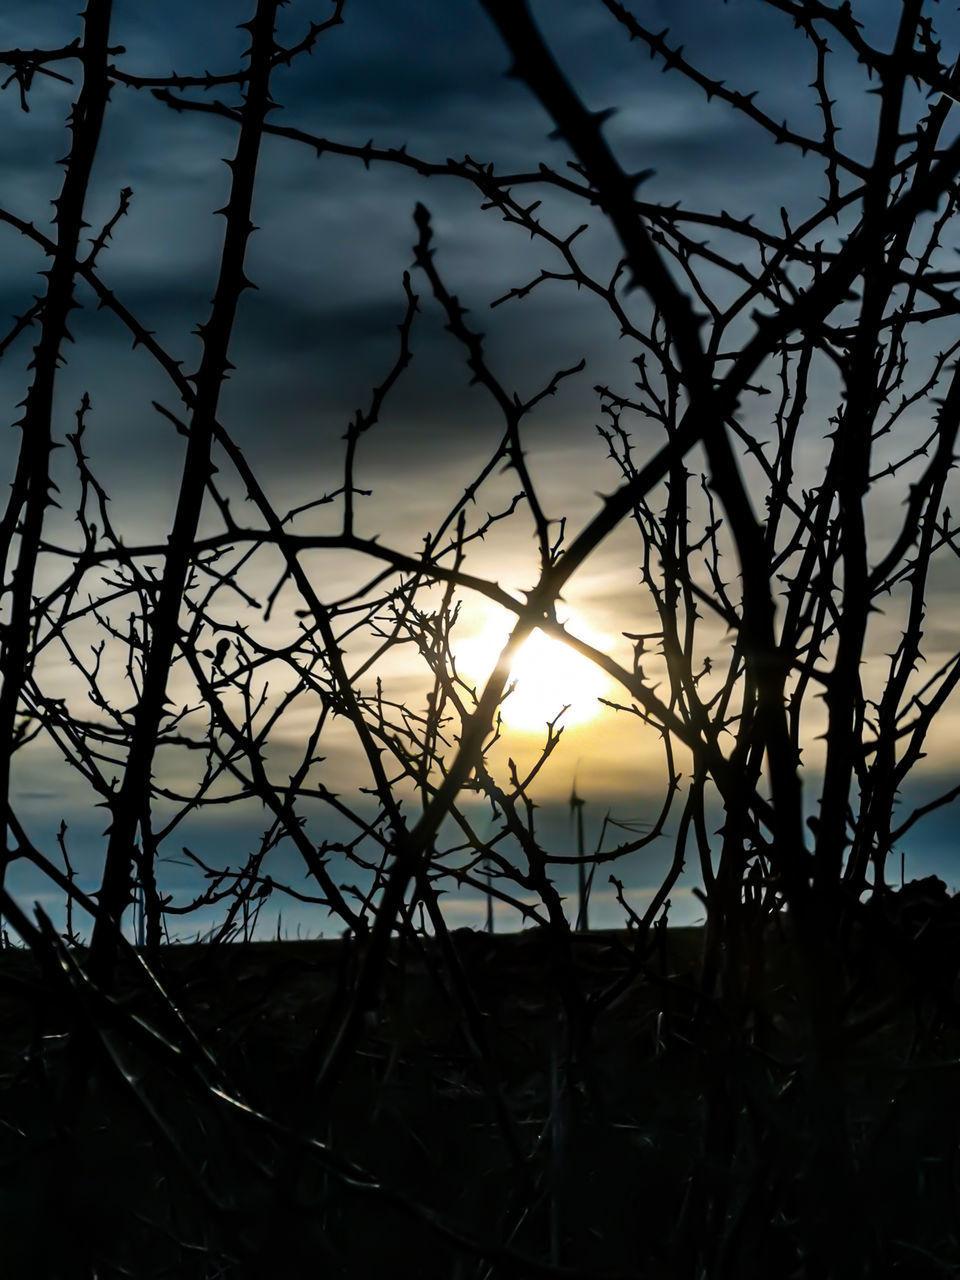 SILHOUETTE BARE TREE AGAINST ORANGE SKY